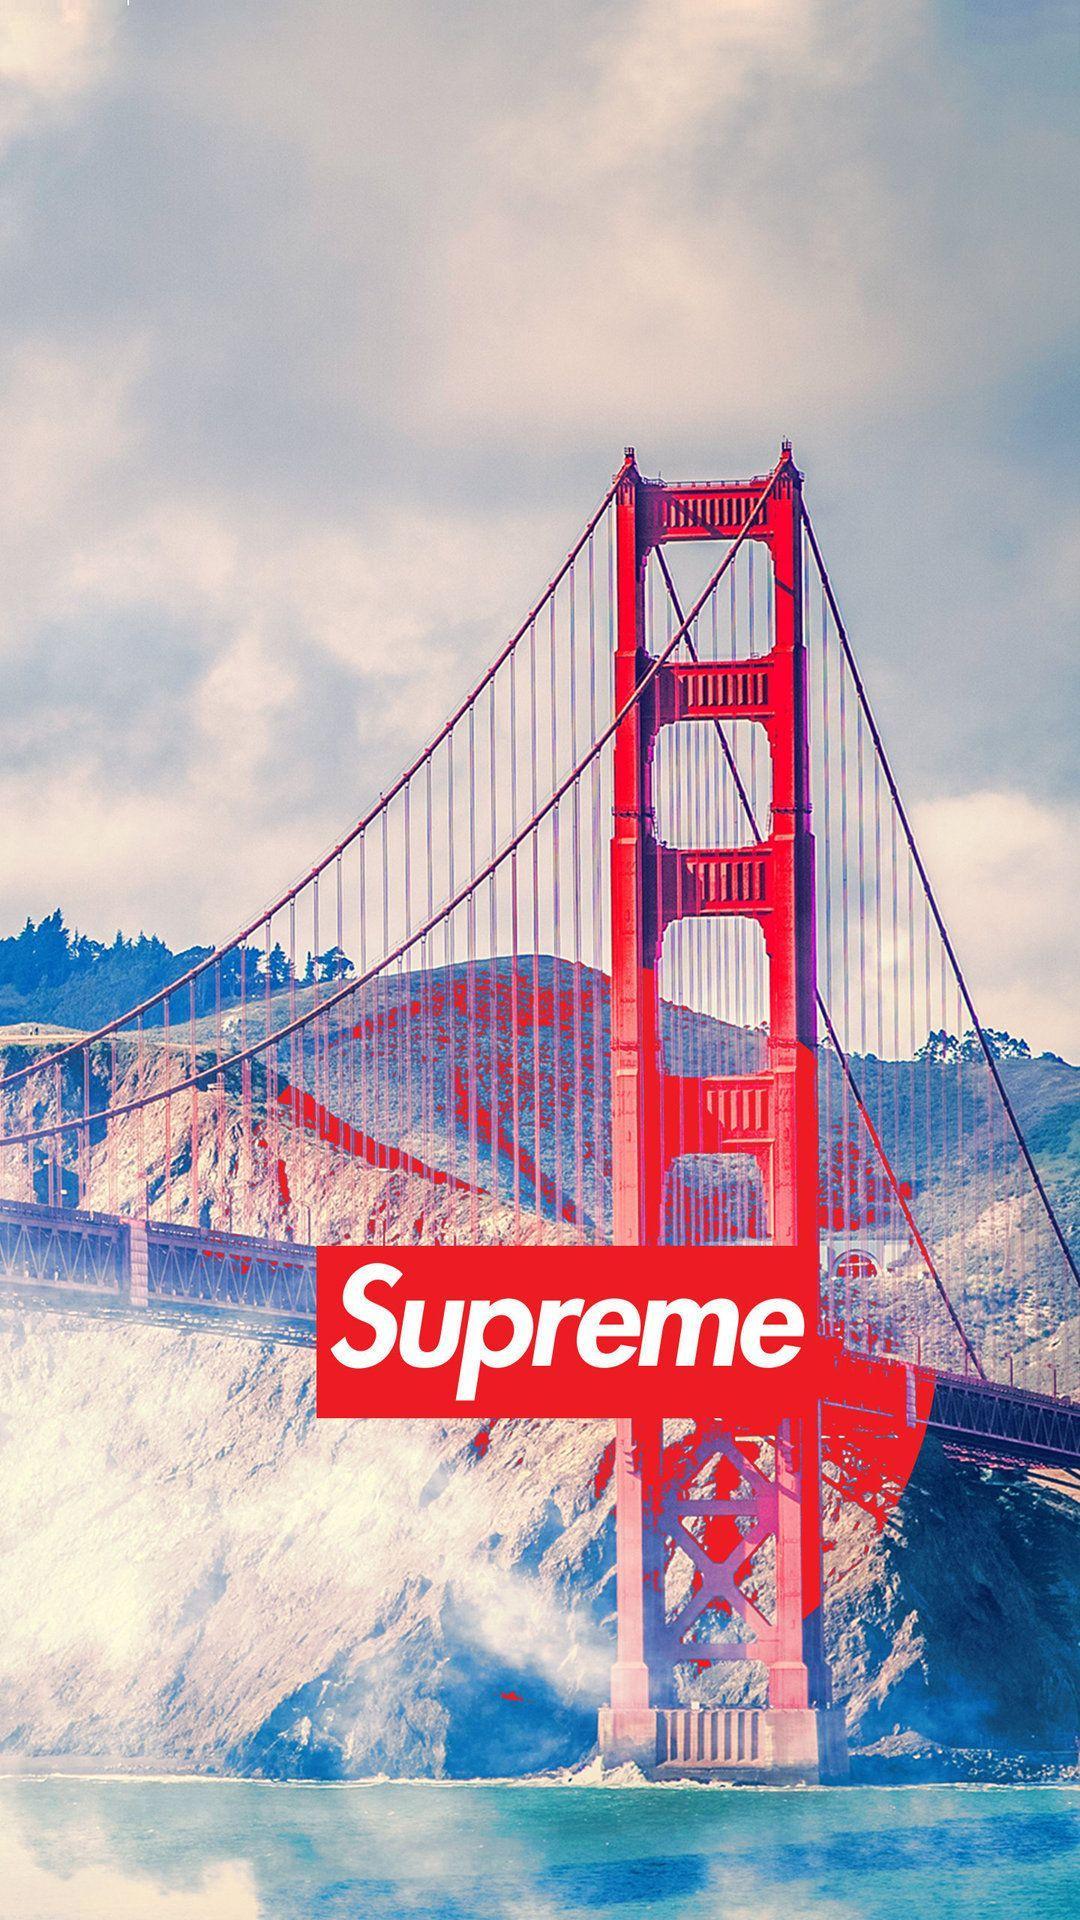 Supreme Macbook Wallpaper Hd